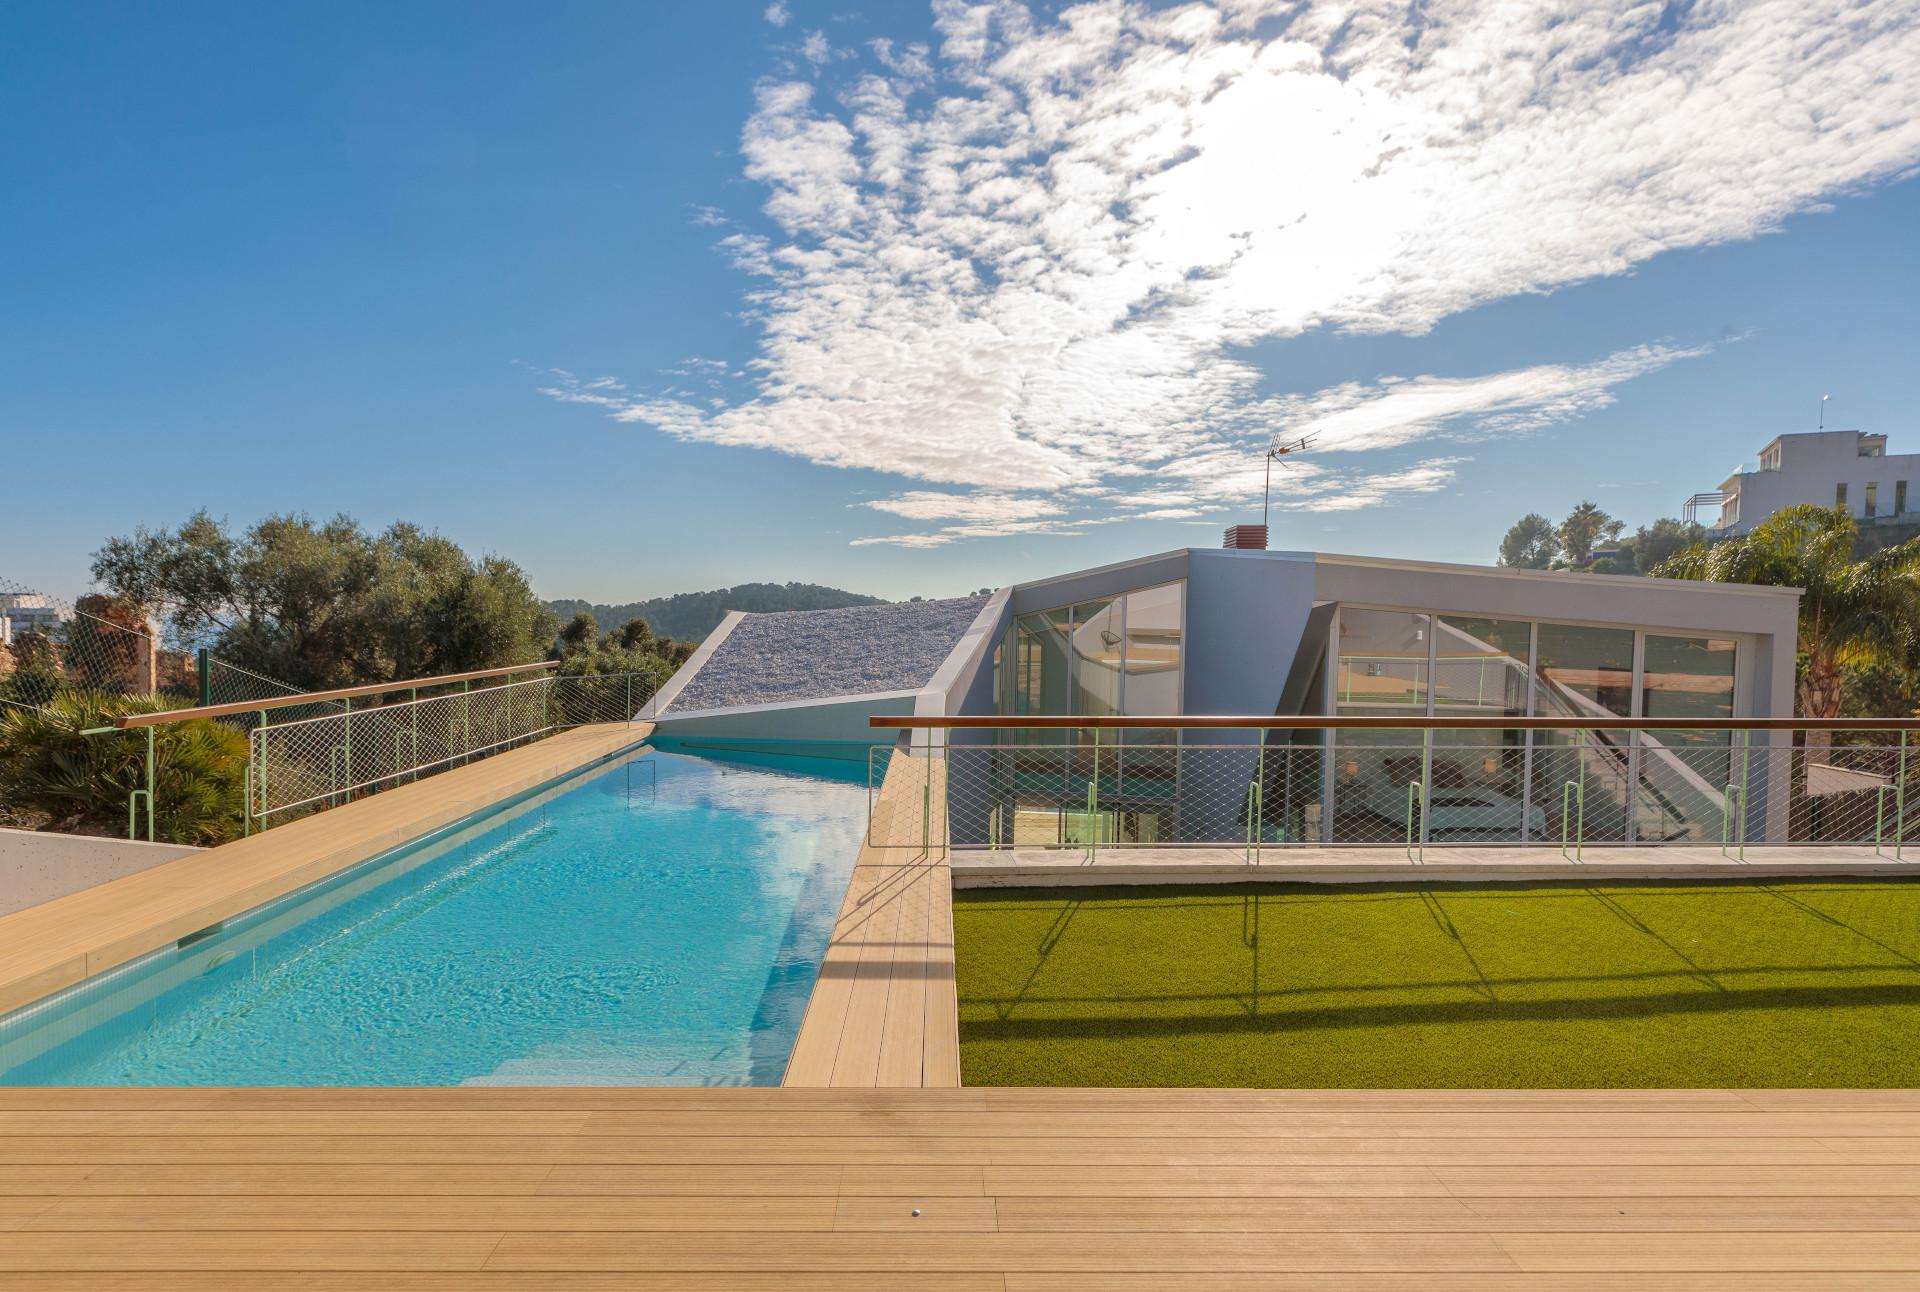 Casa con piscina Sitges